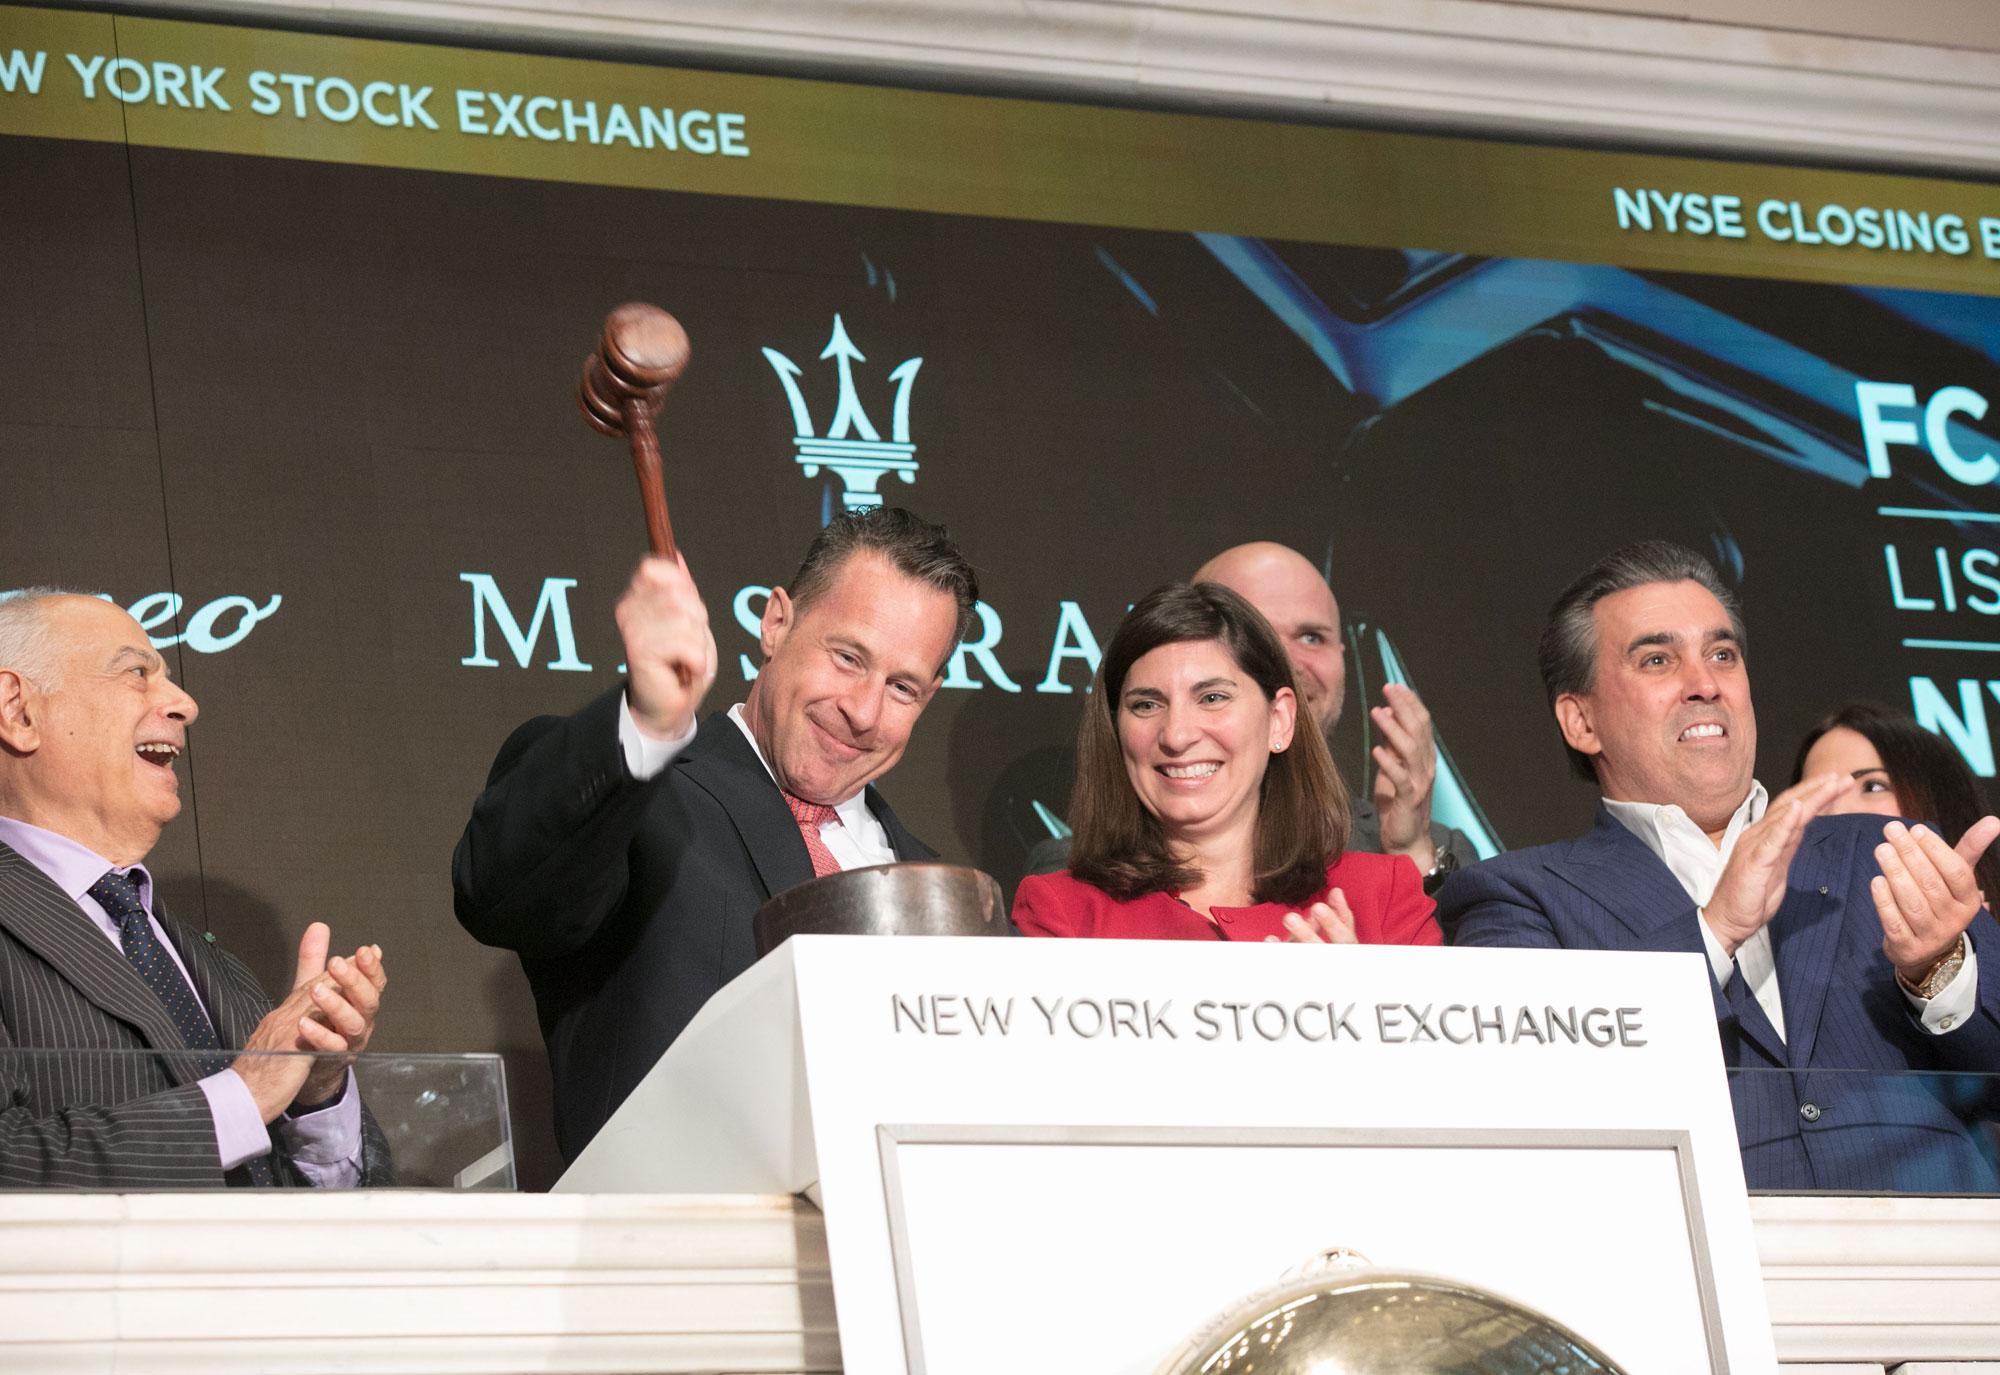 Maserati-CEO-Reid-Bigland-at-New-York-Stock-Exchange_2017_1.jpg